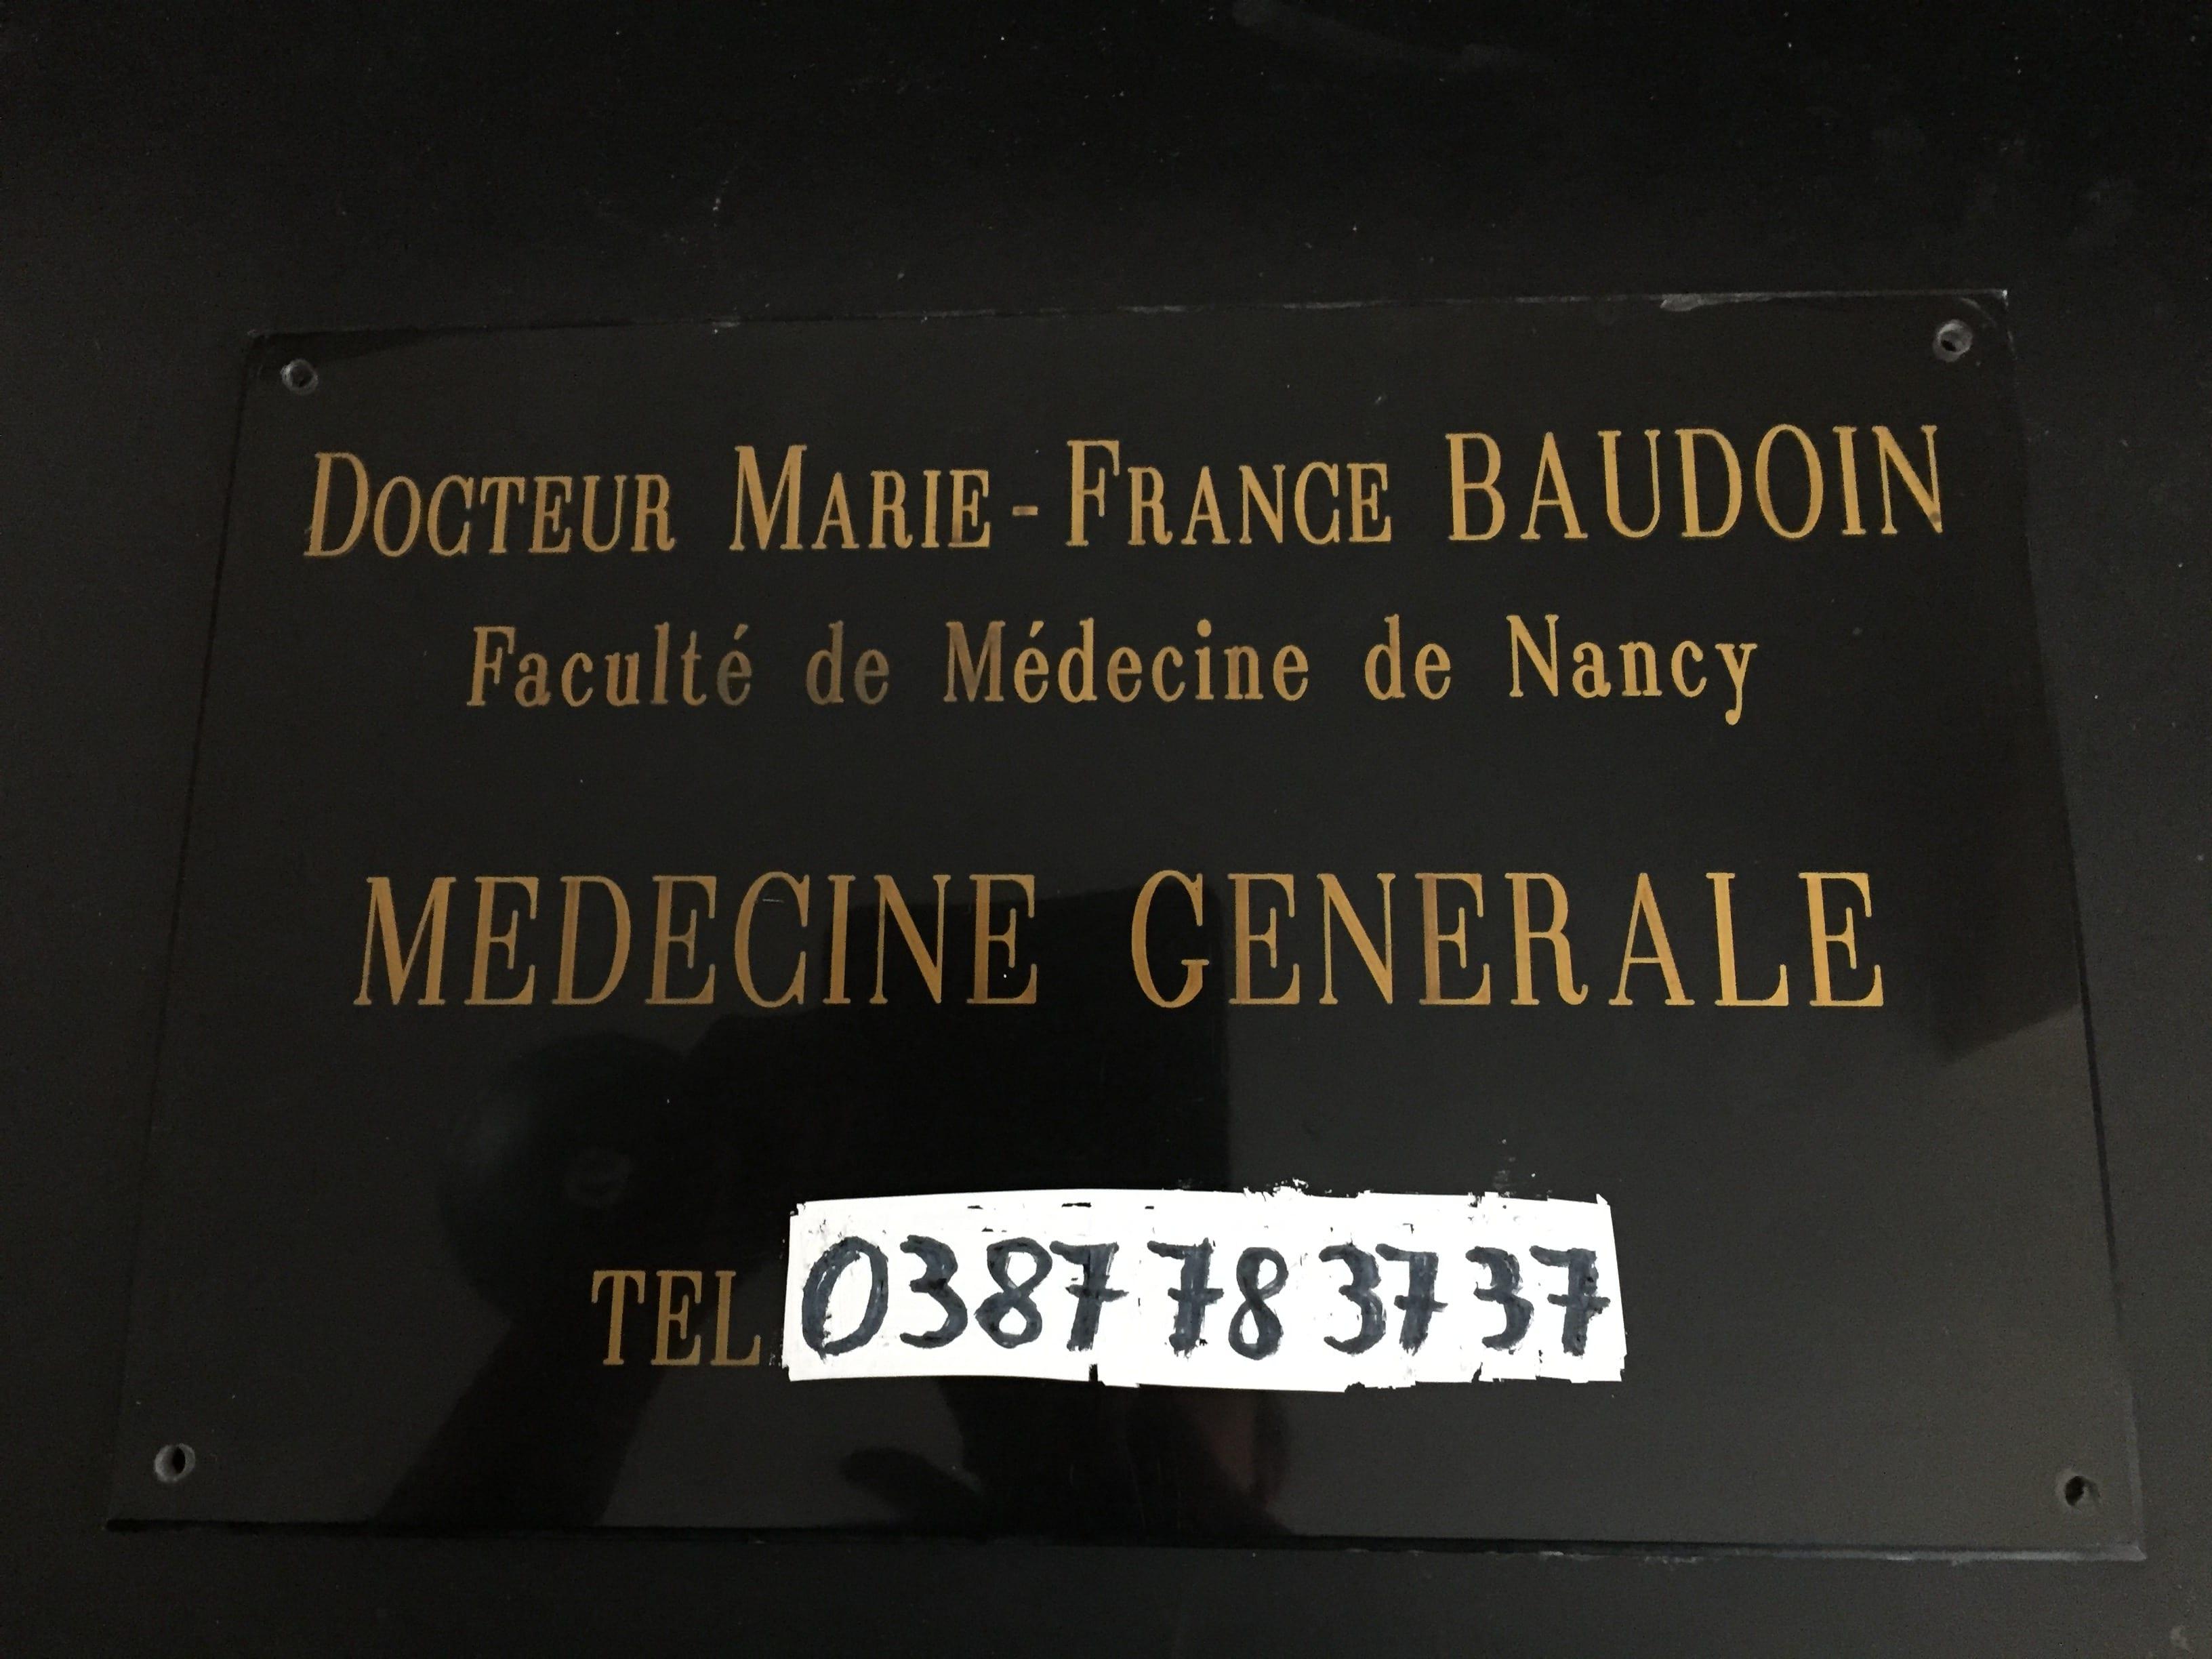 DrBaudoinMarie